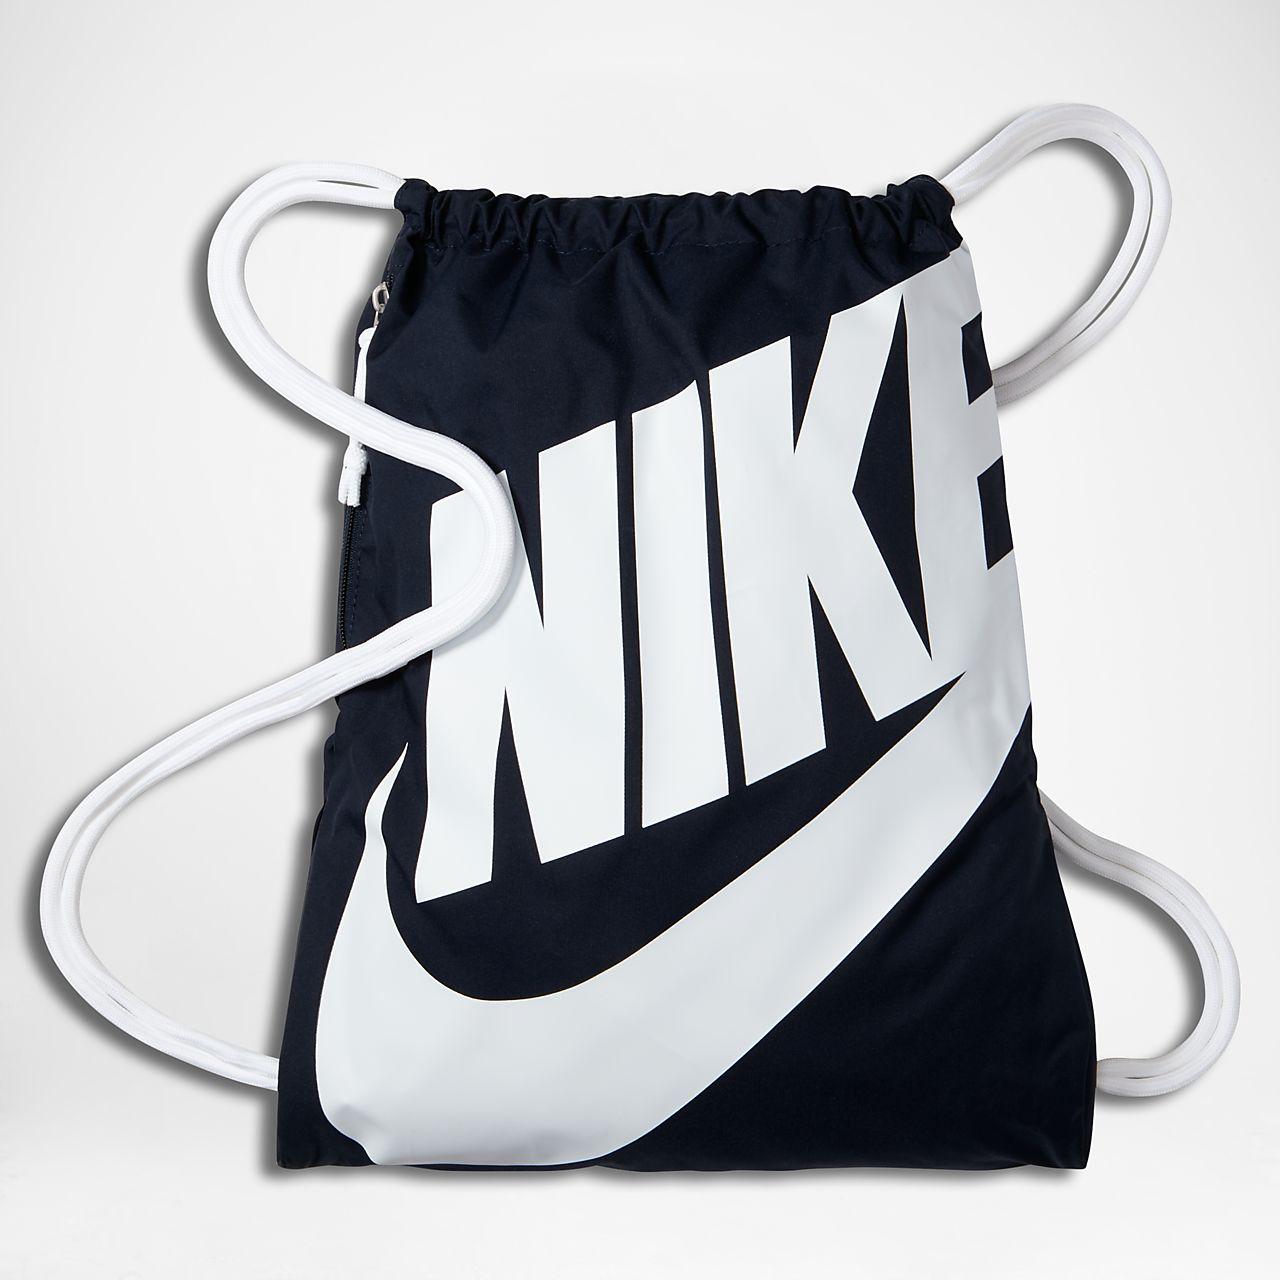 45dcf32a95 Sacca per la palestra Nike Sportswear Heritage. Nike.com IT